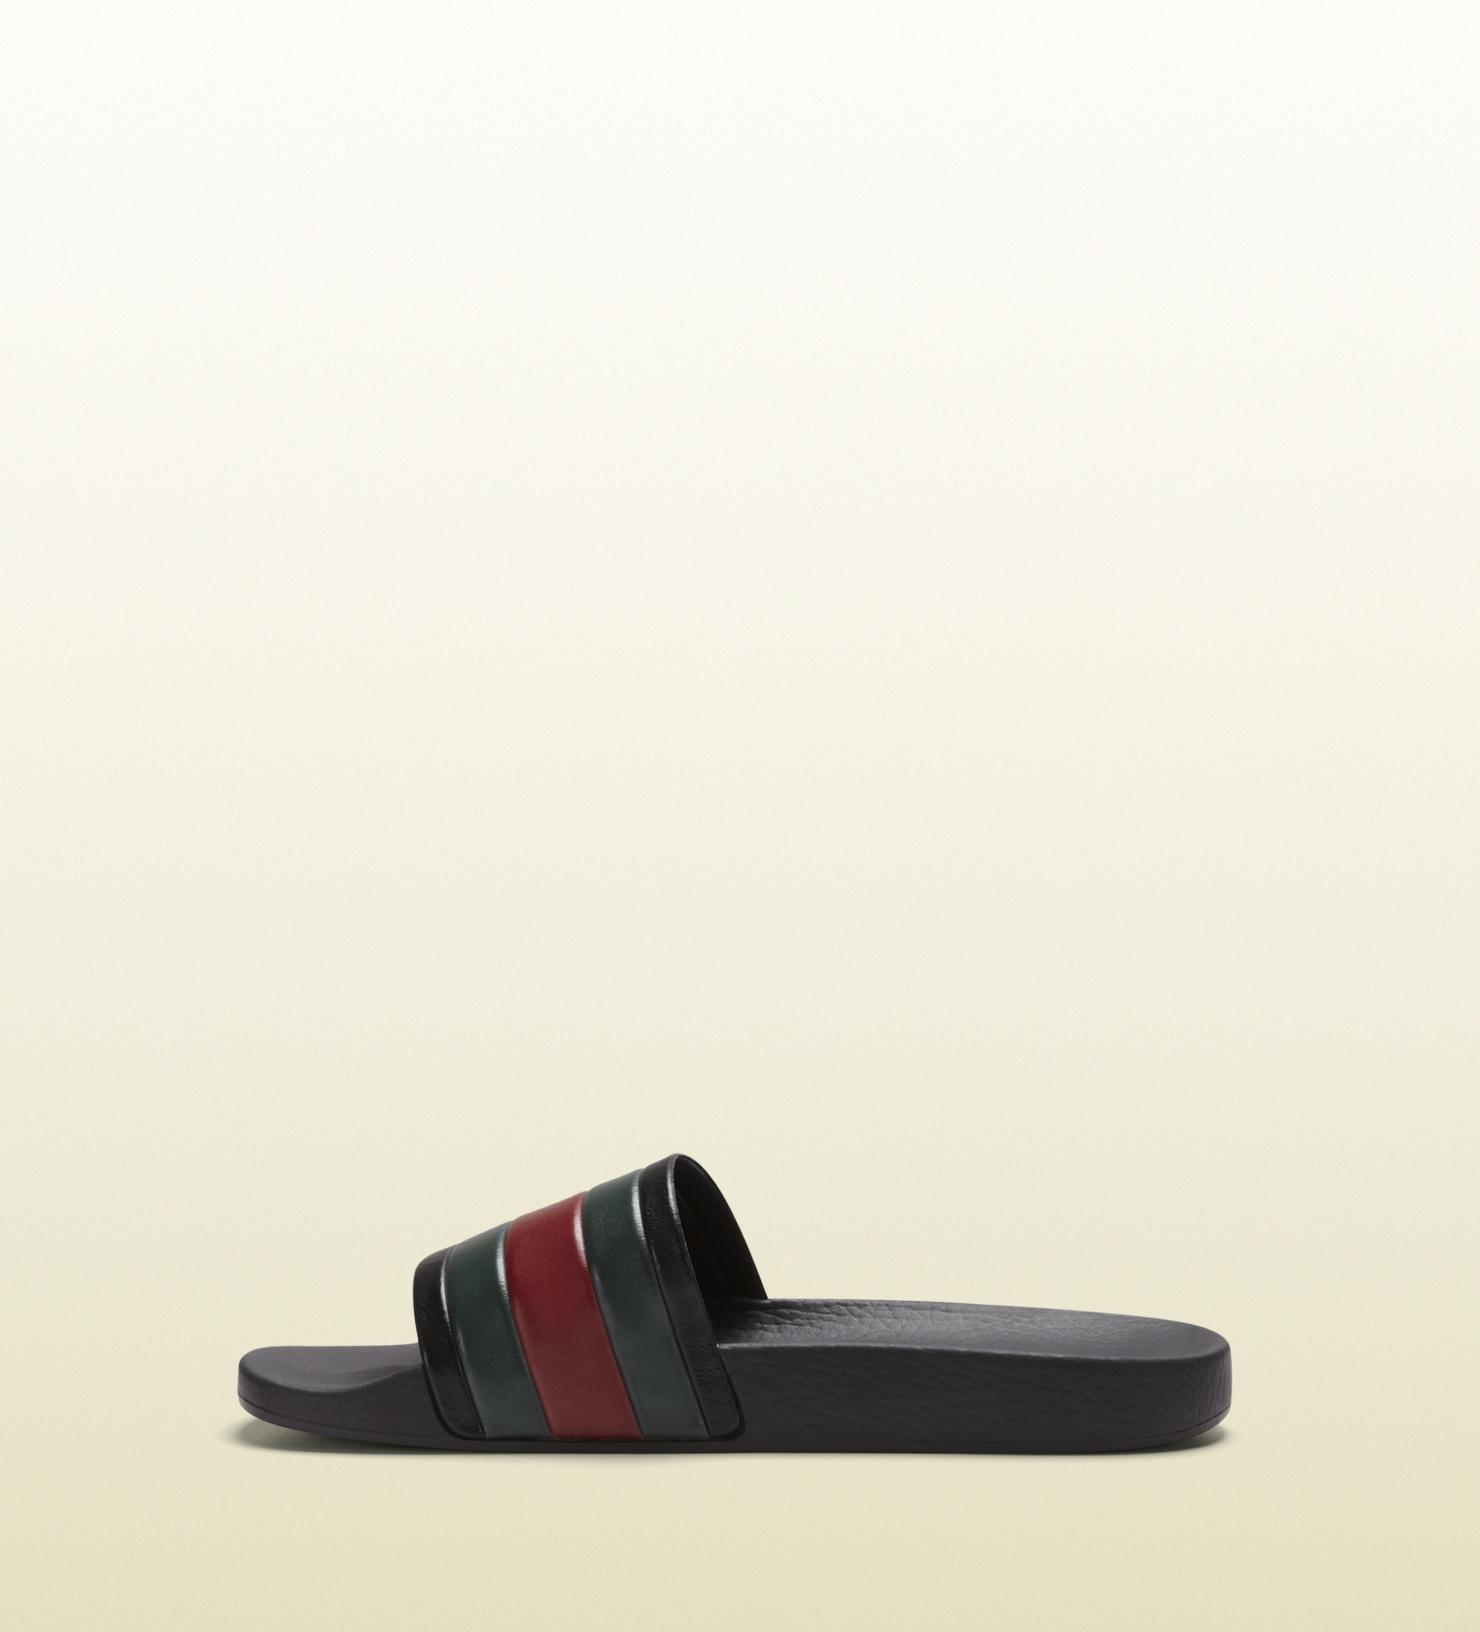 897b5289e9496 Gucci Logo Rubber Slide Sandal Black